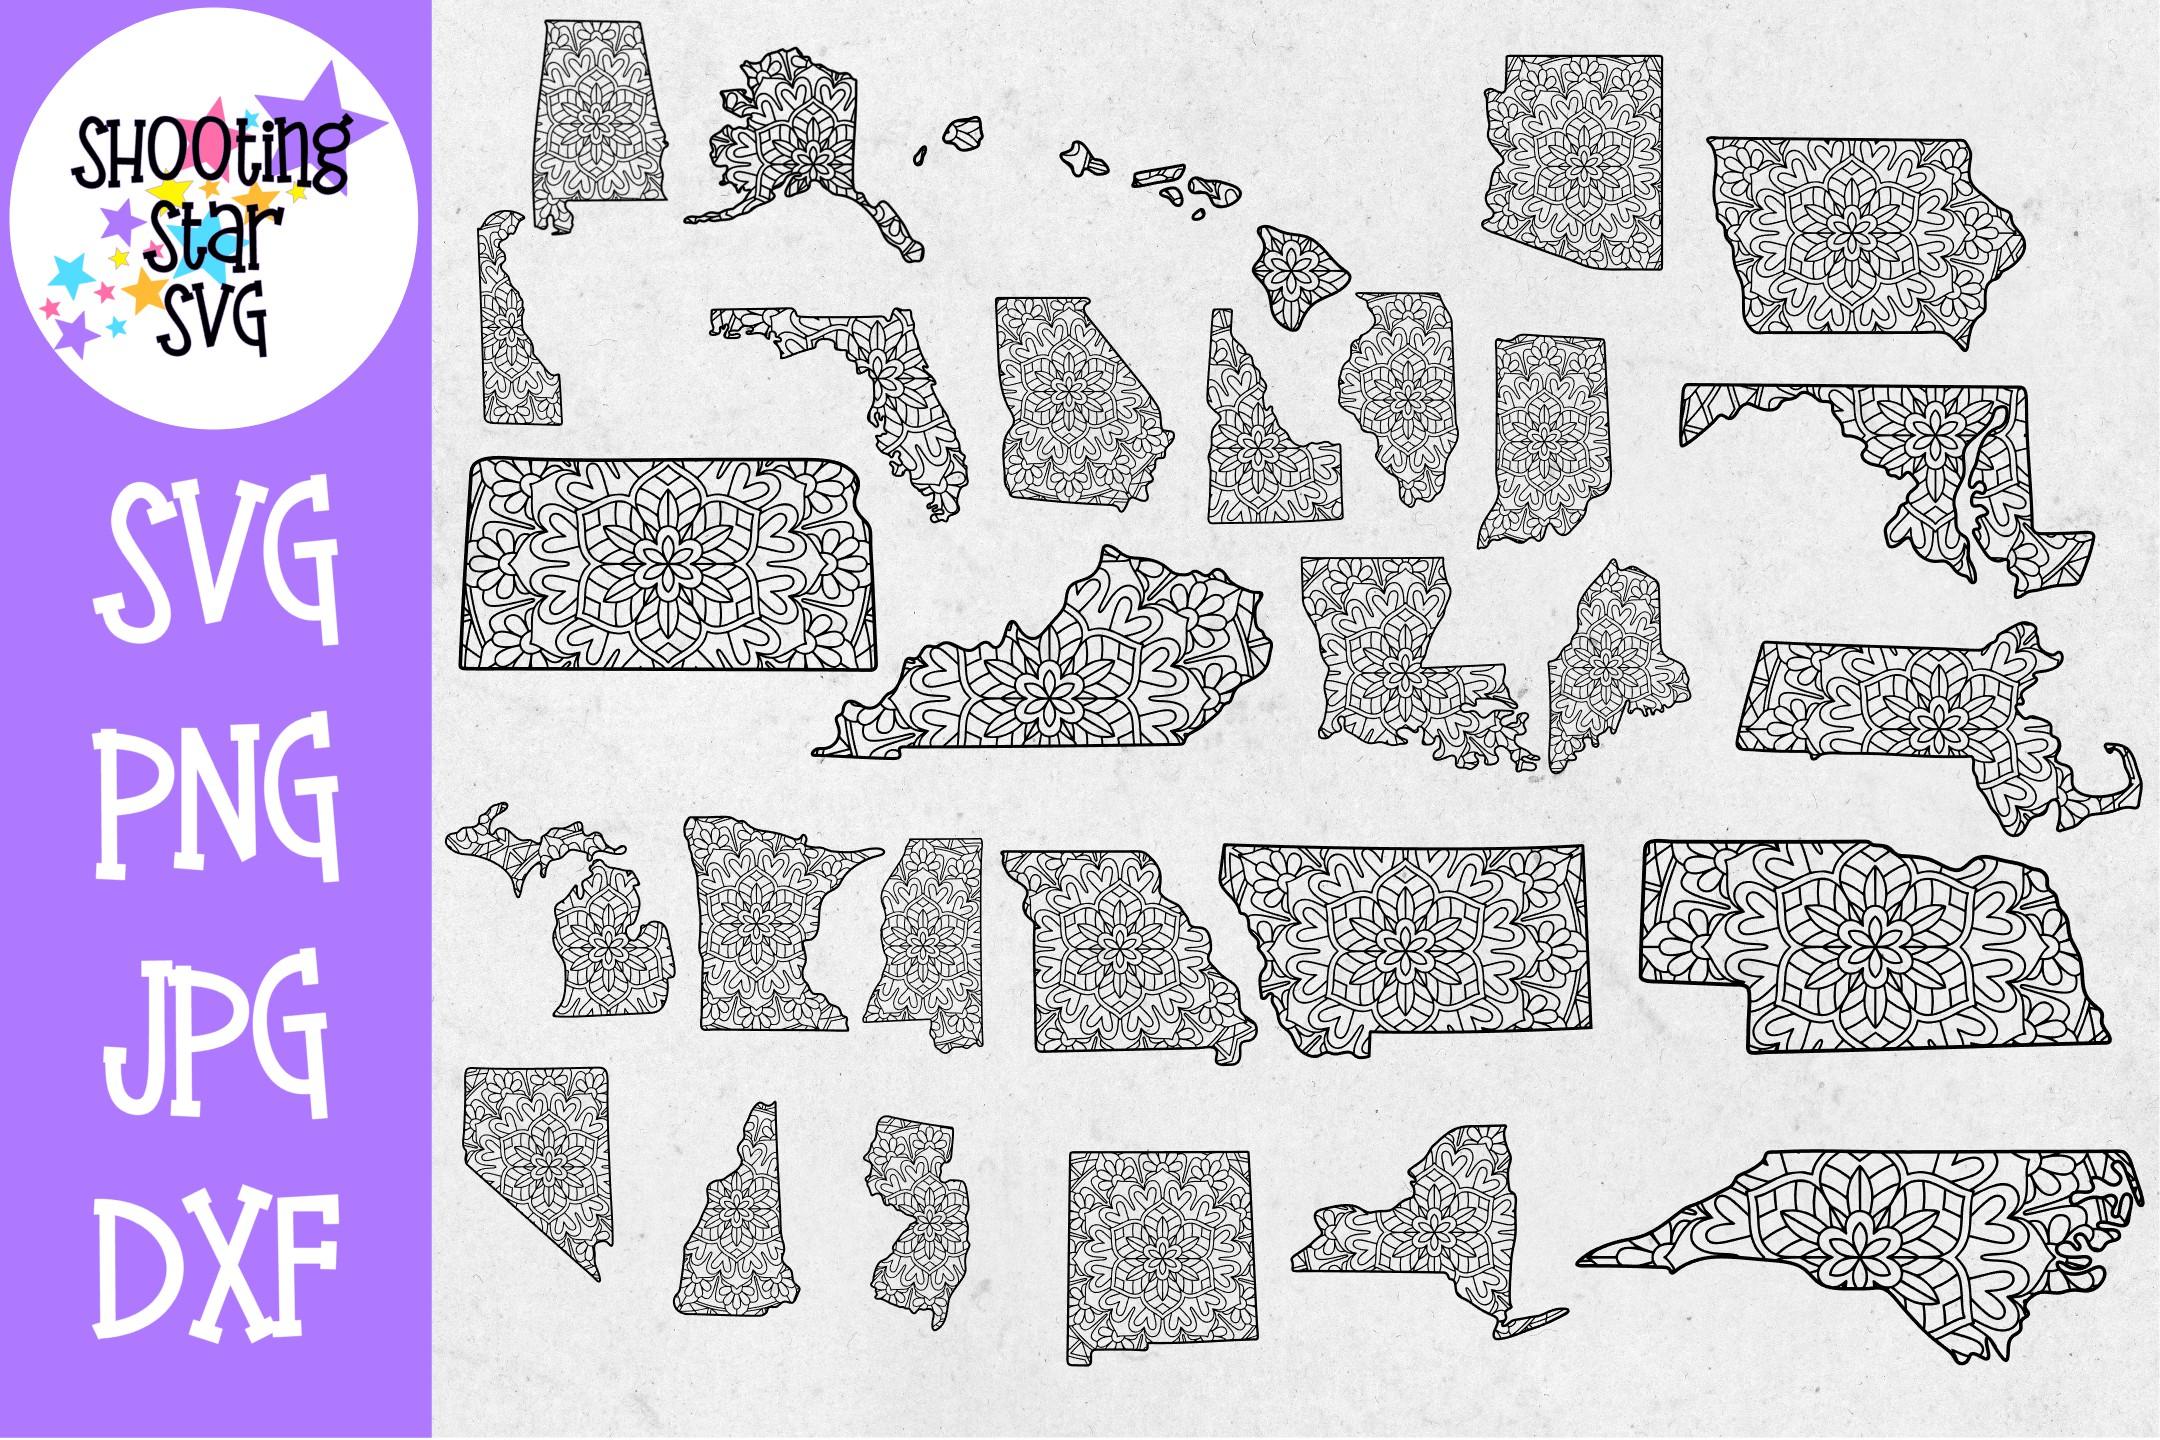 US State MEGA Bundle - 5 US State Bundles - US State SVG example image 4